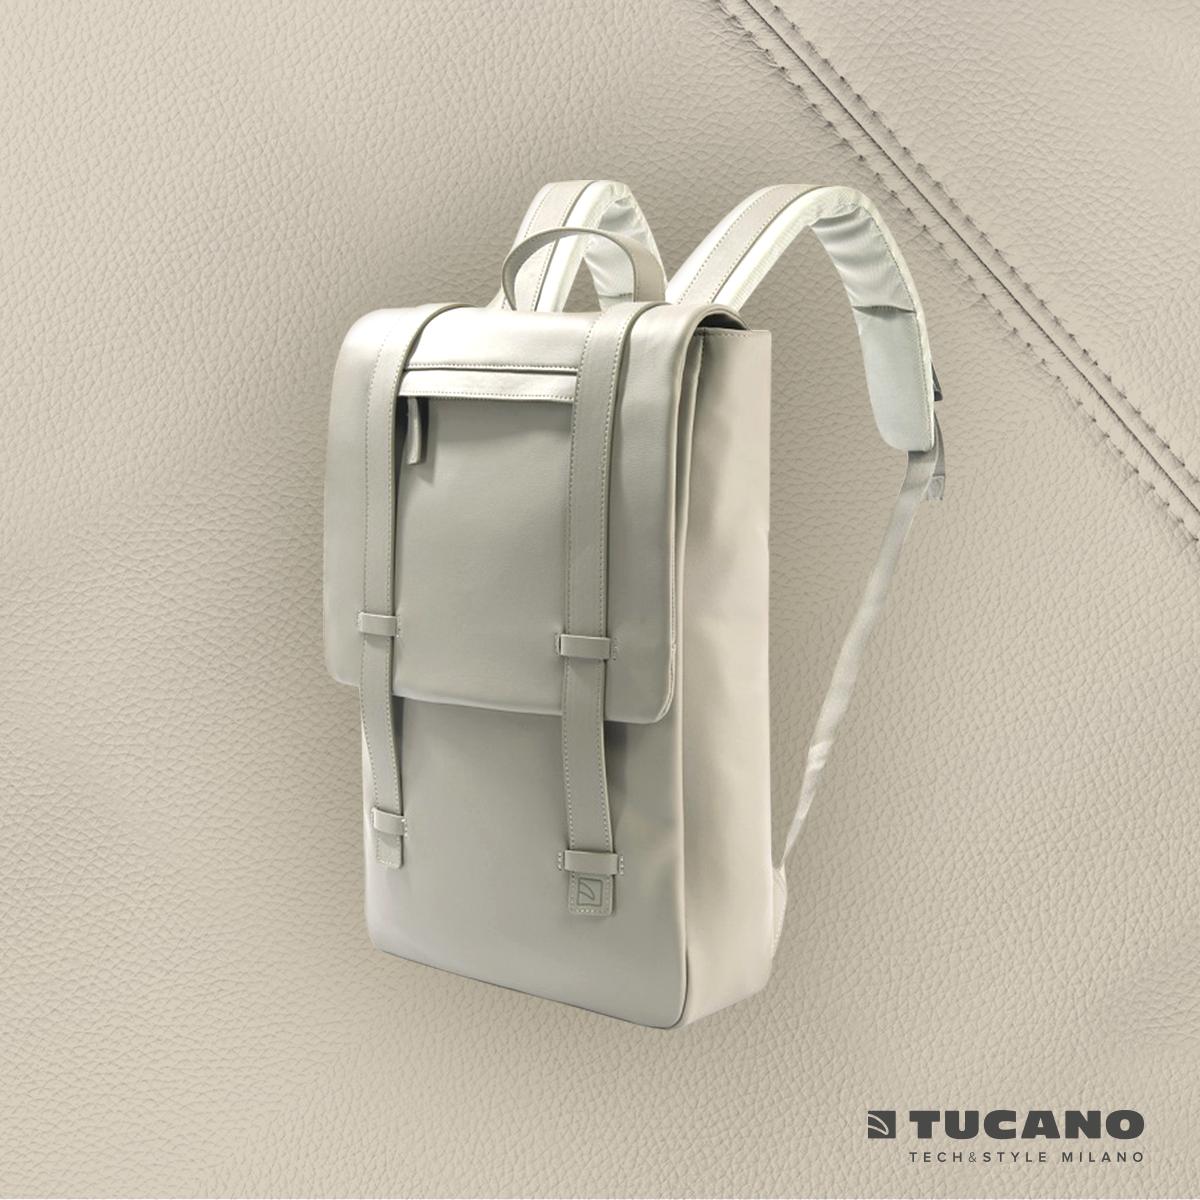 tucano_lug13-19_05